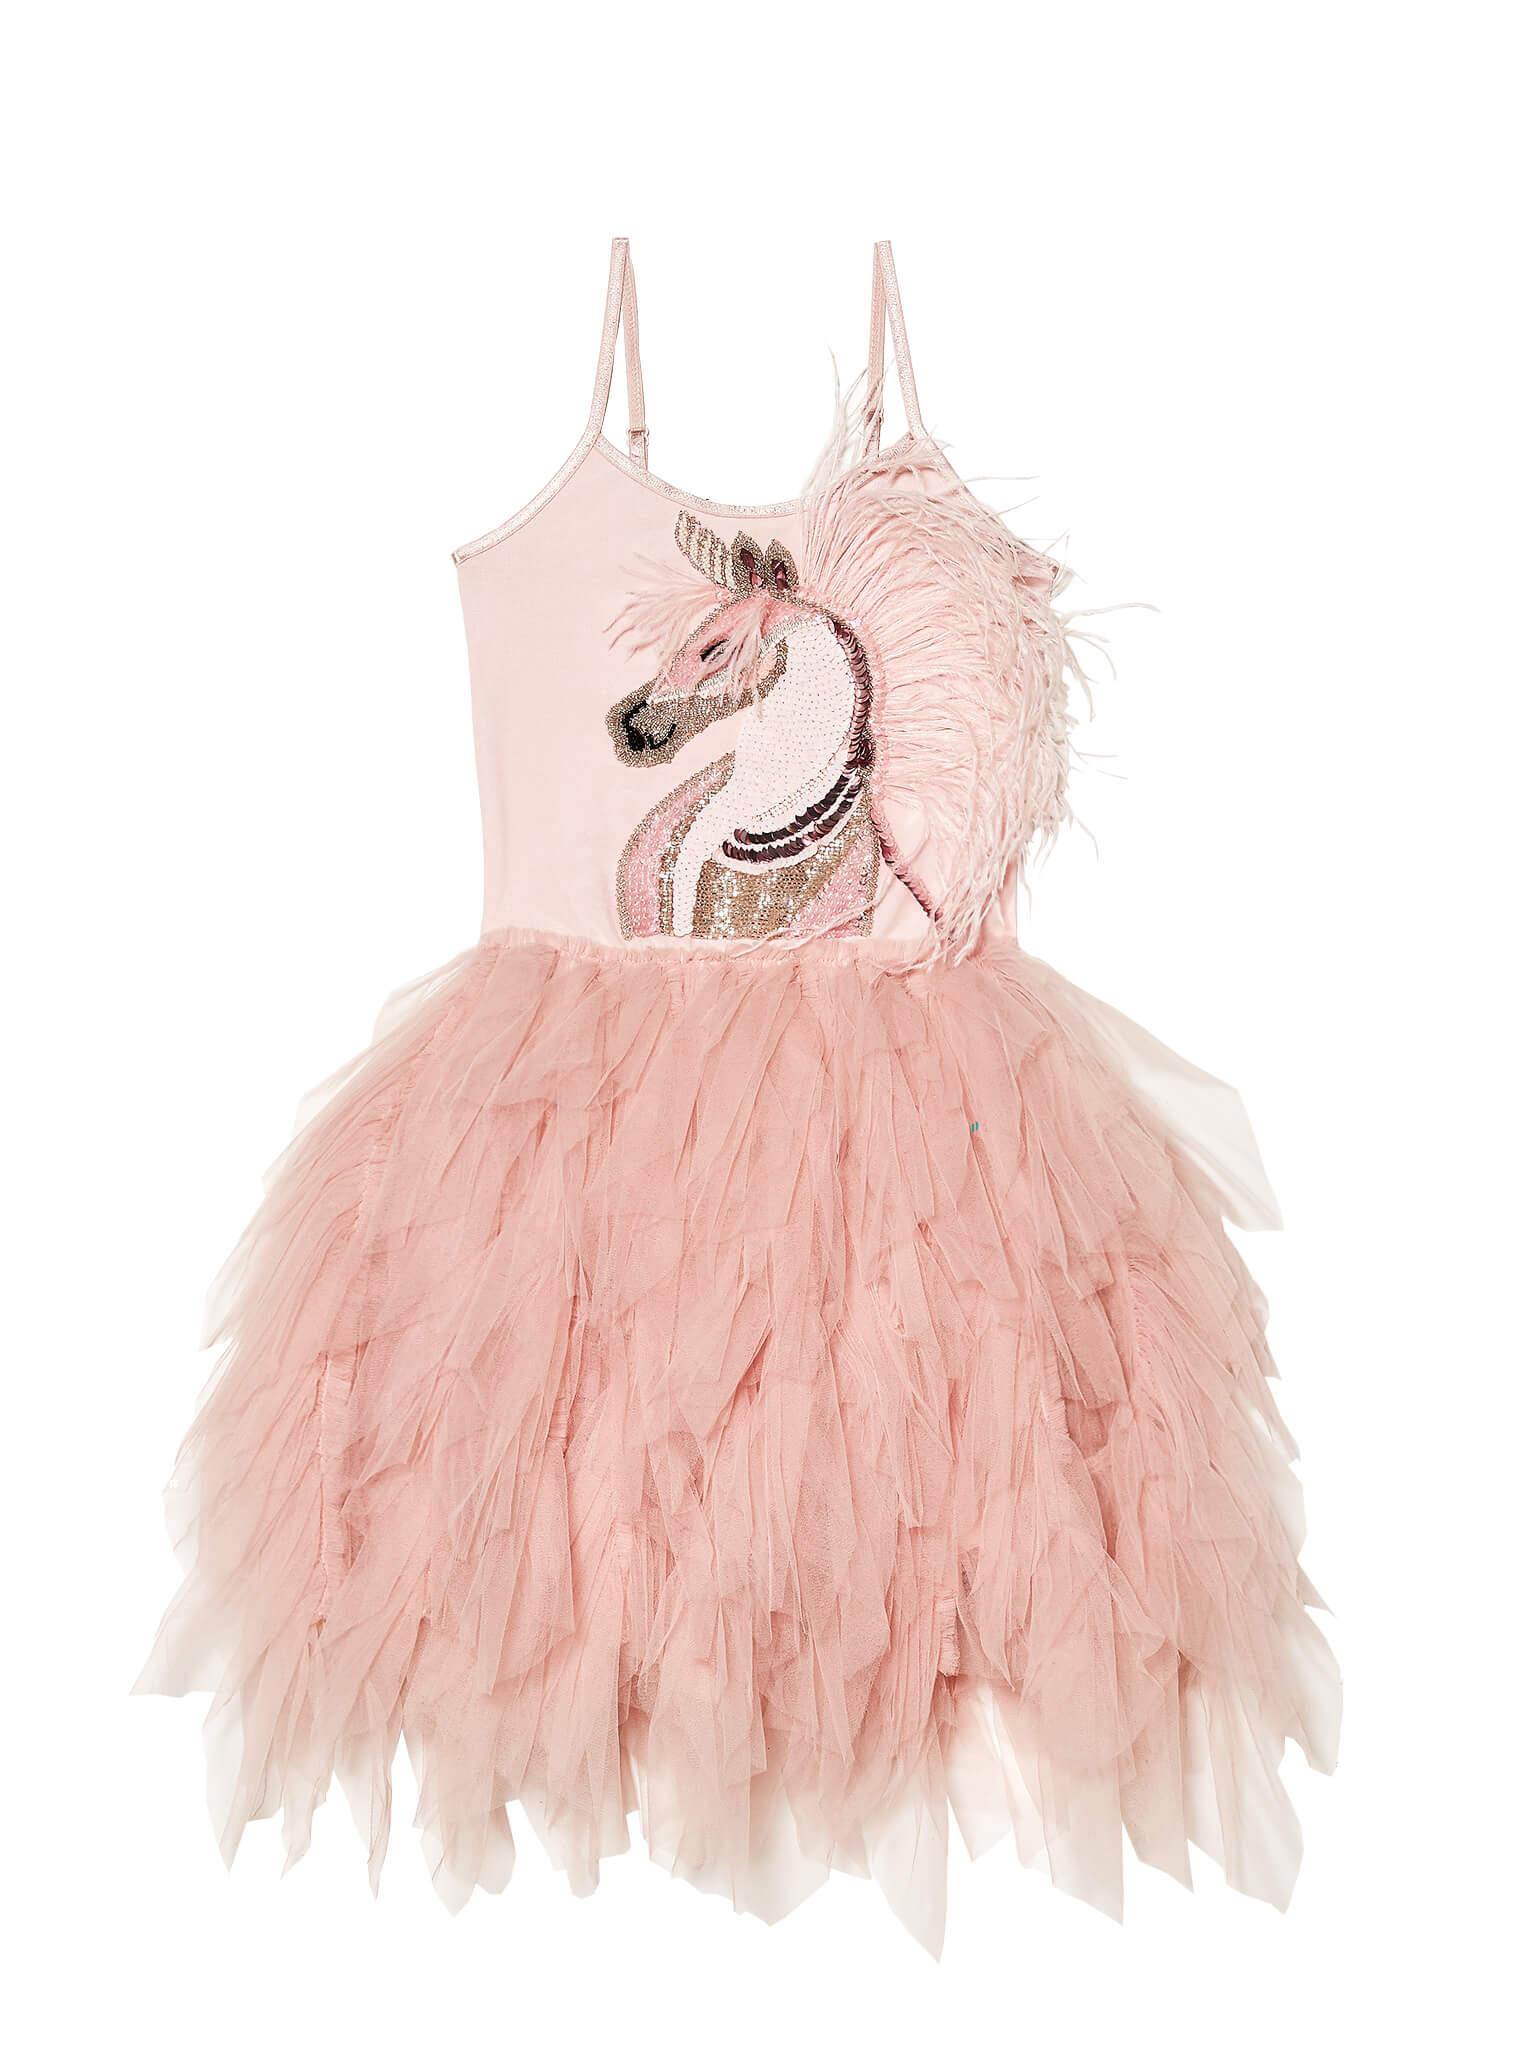 Tdm4294 rosewood unicorn tutu dress 01